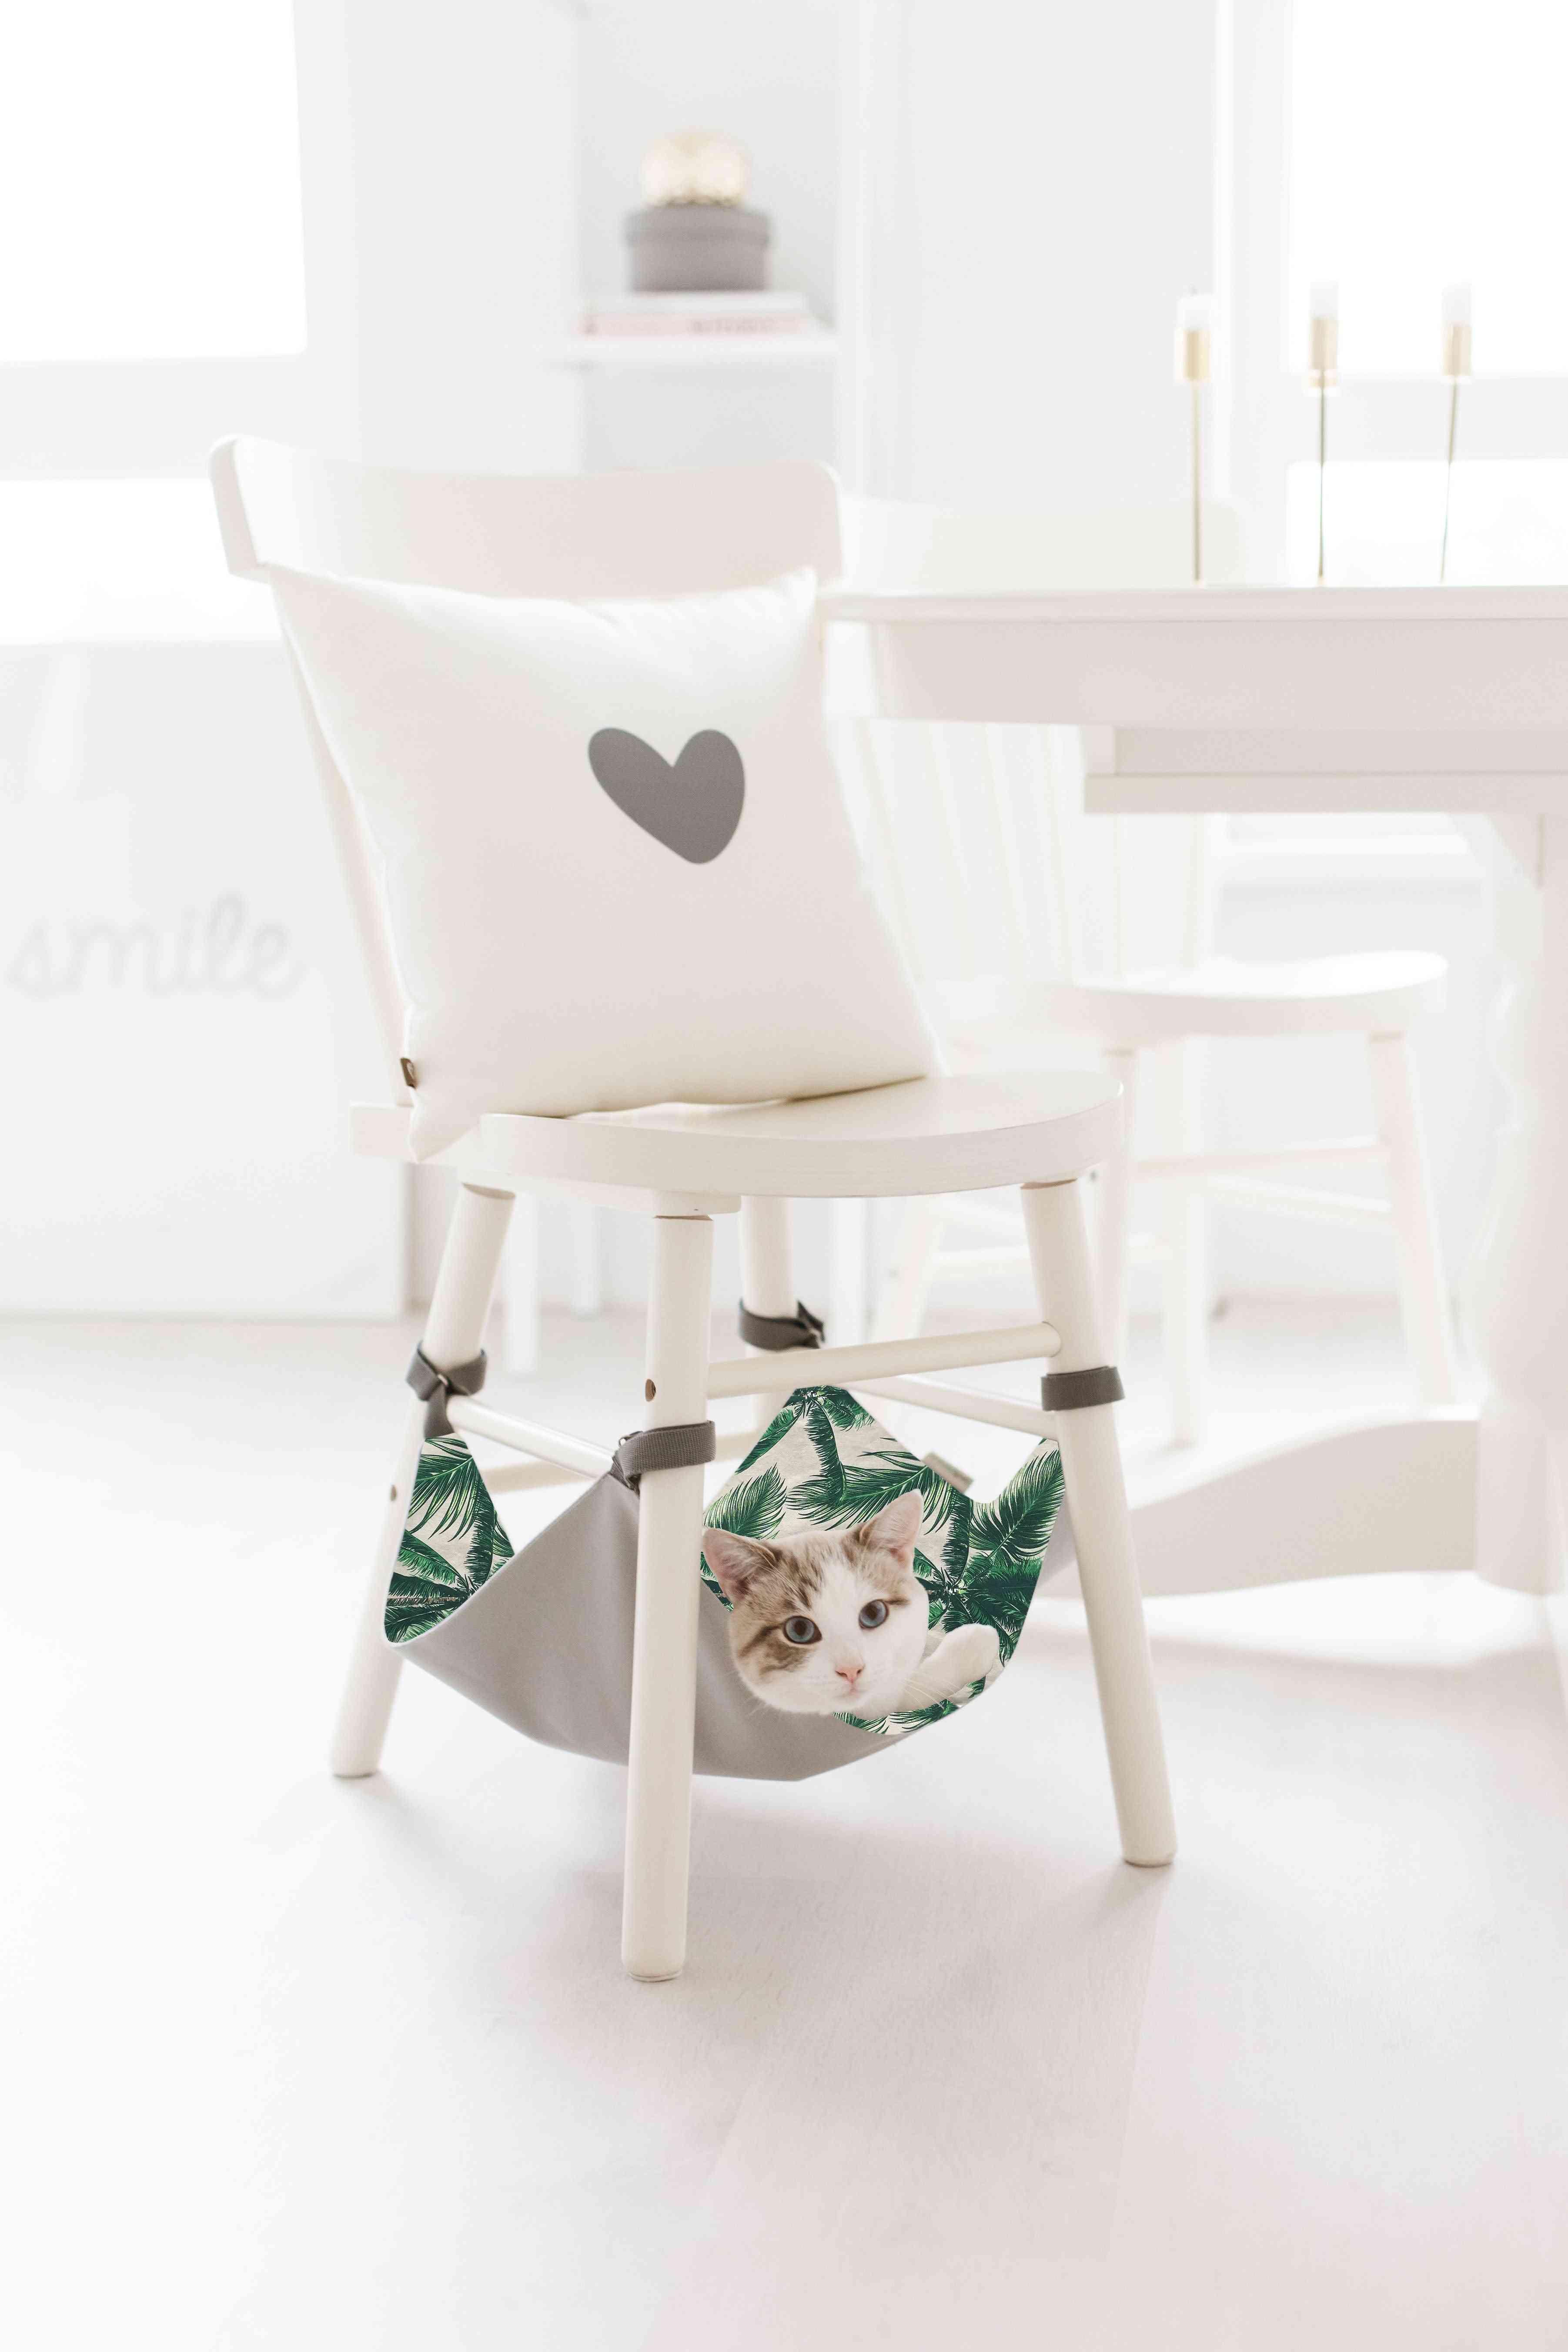 Saveplace® Hanging Mat For Storage & Pets – Holidays